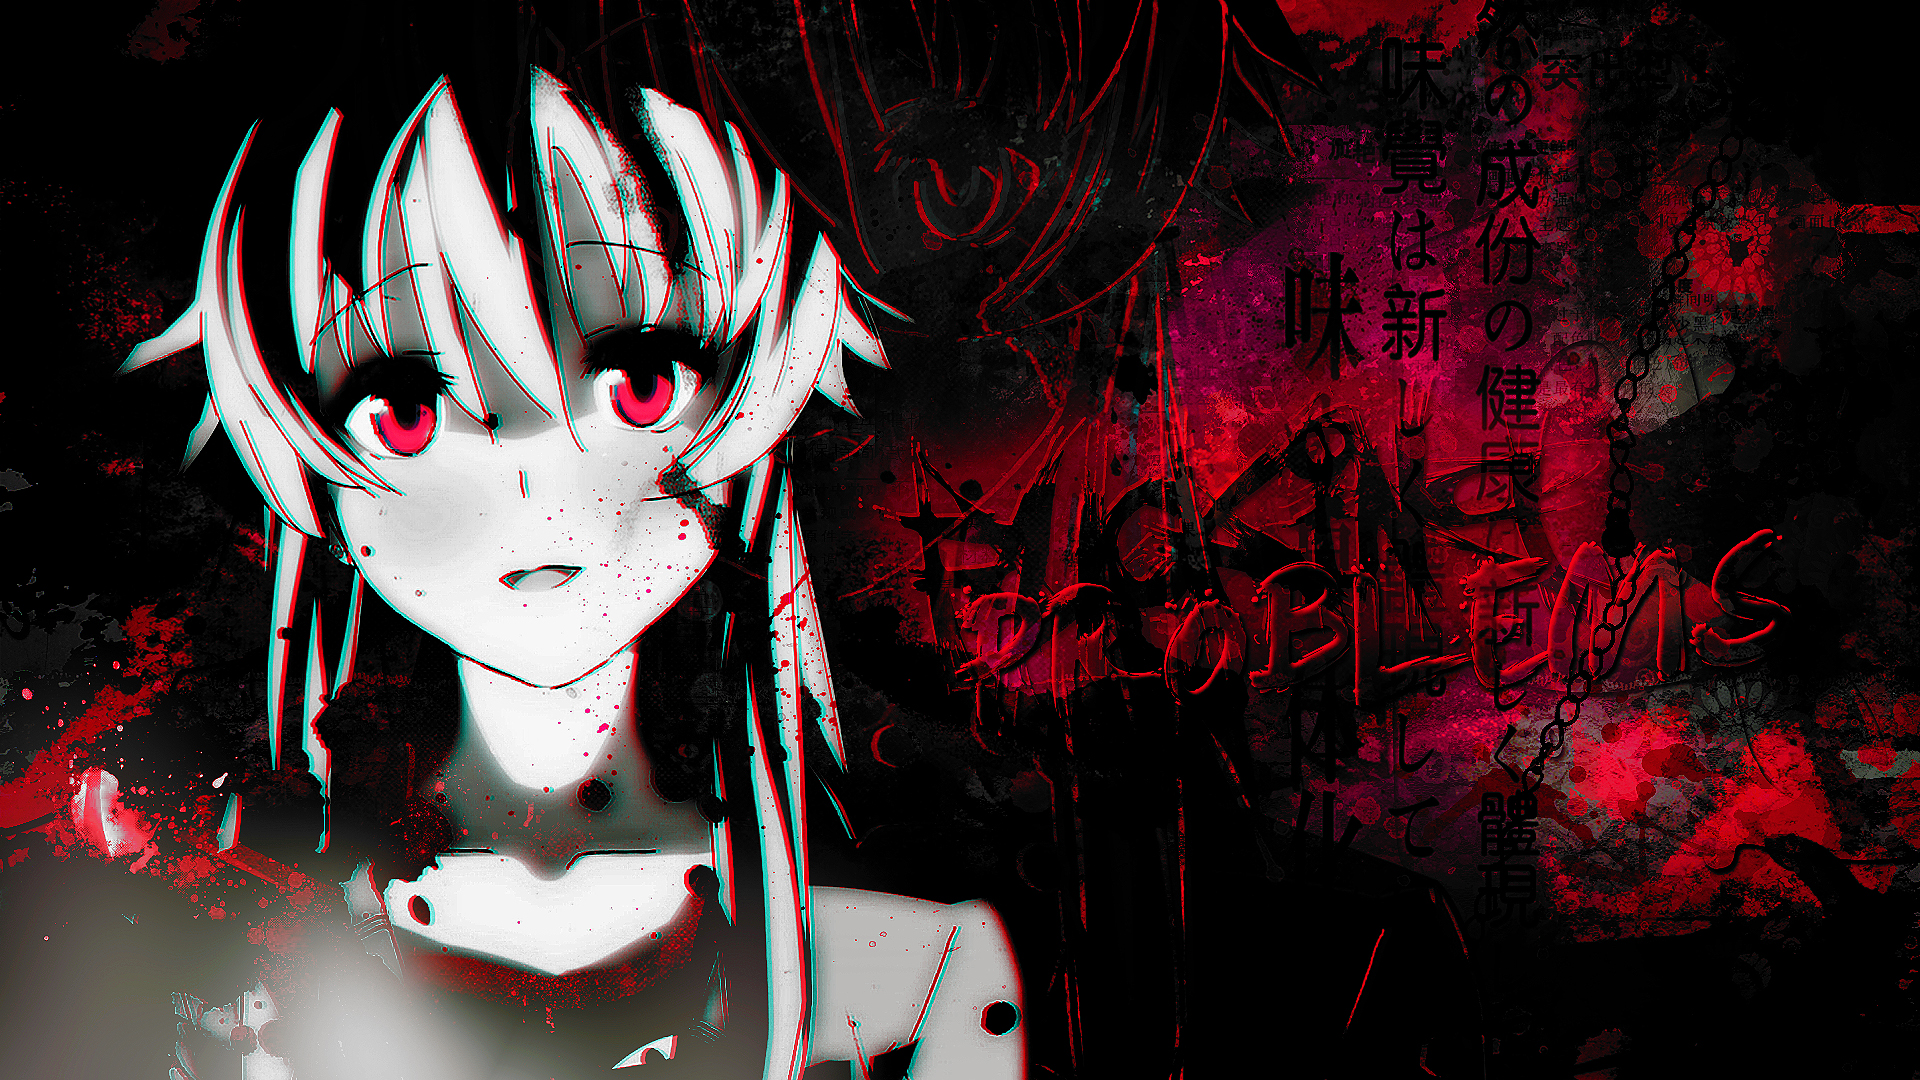 Unduh 4400 Wallpaper Anime Psikopat Hd HD Paling Keren